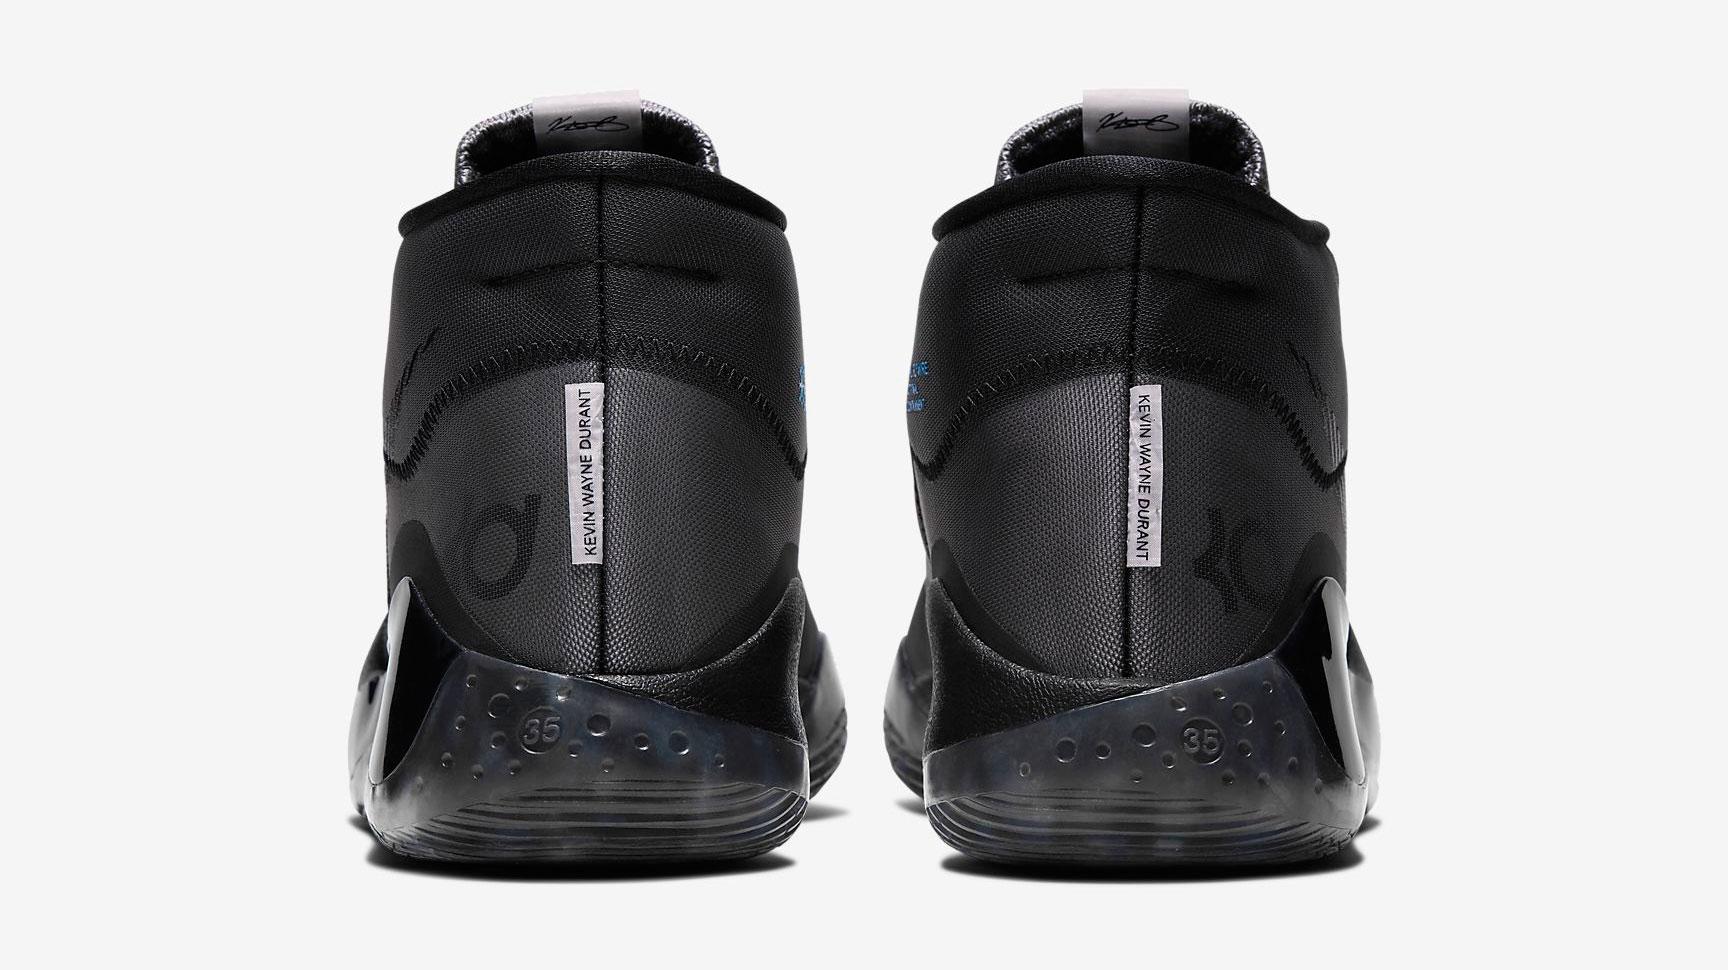 nike-kd-12-black-where-to-buy-5